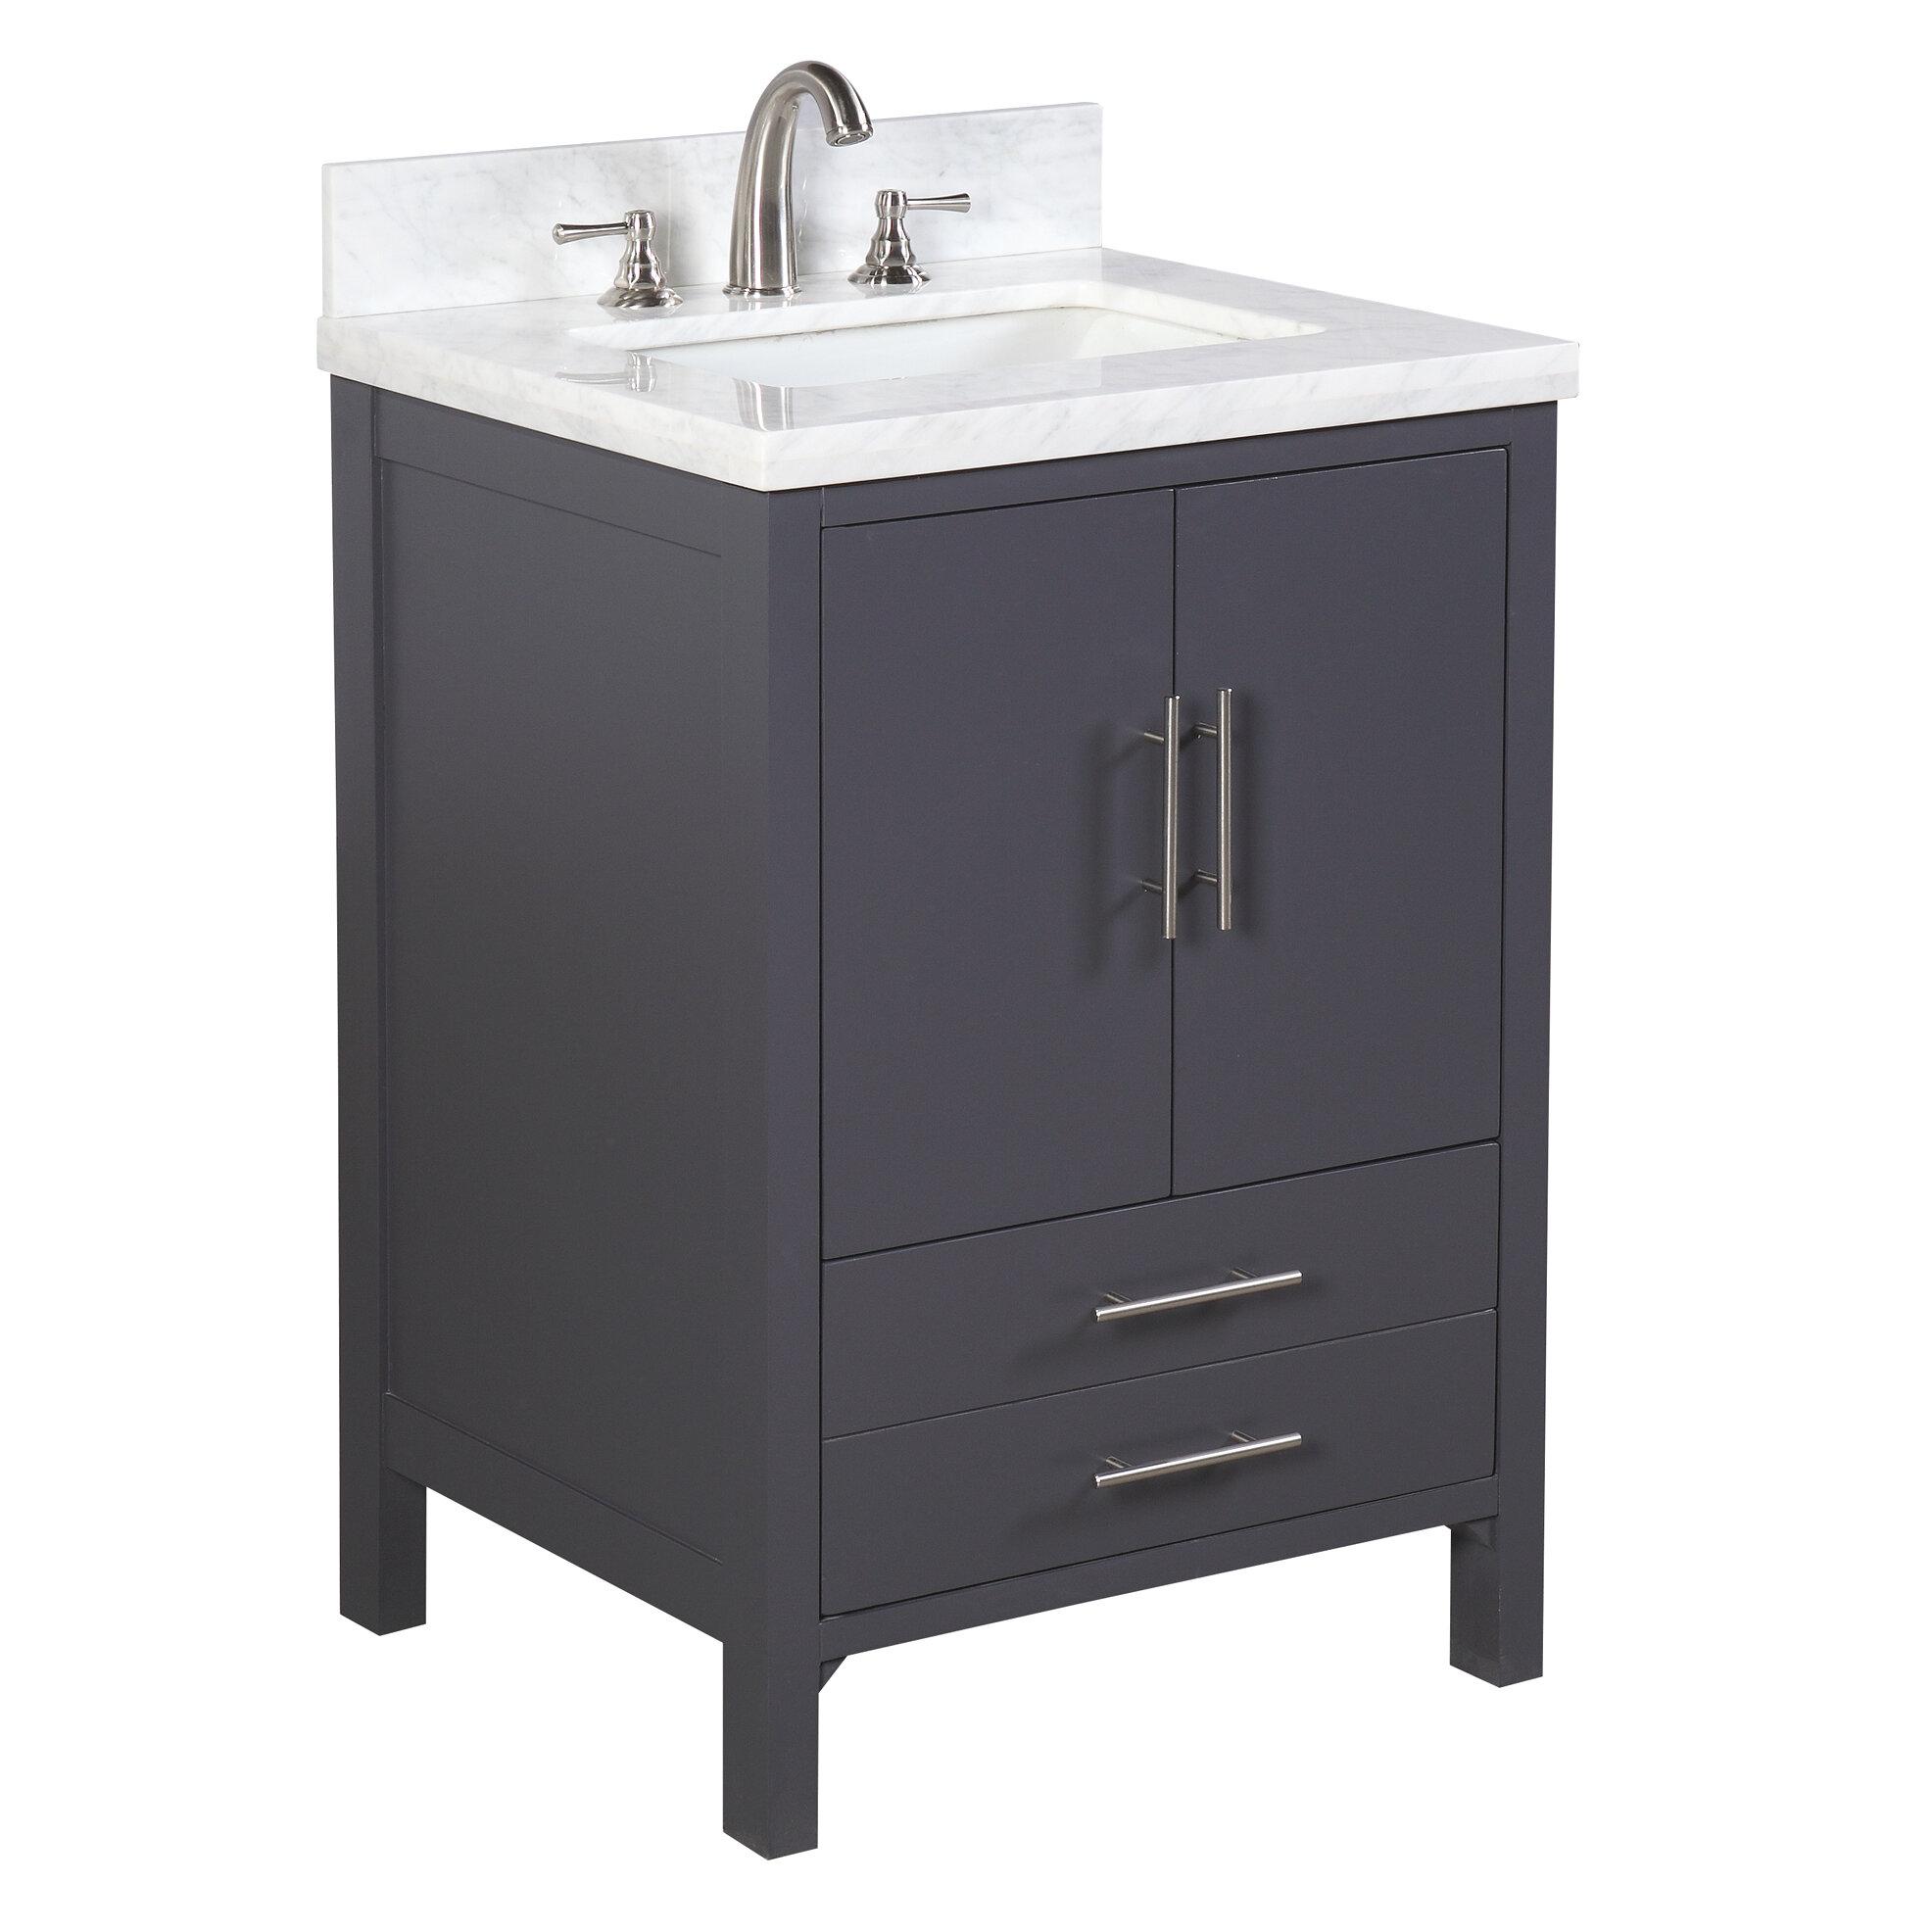 bathroom vanities miami fl. Bathroom Vanities Miami Fl E